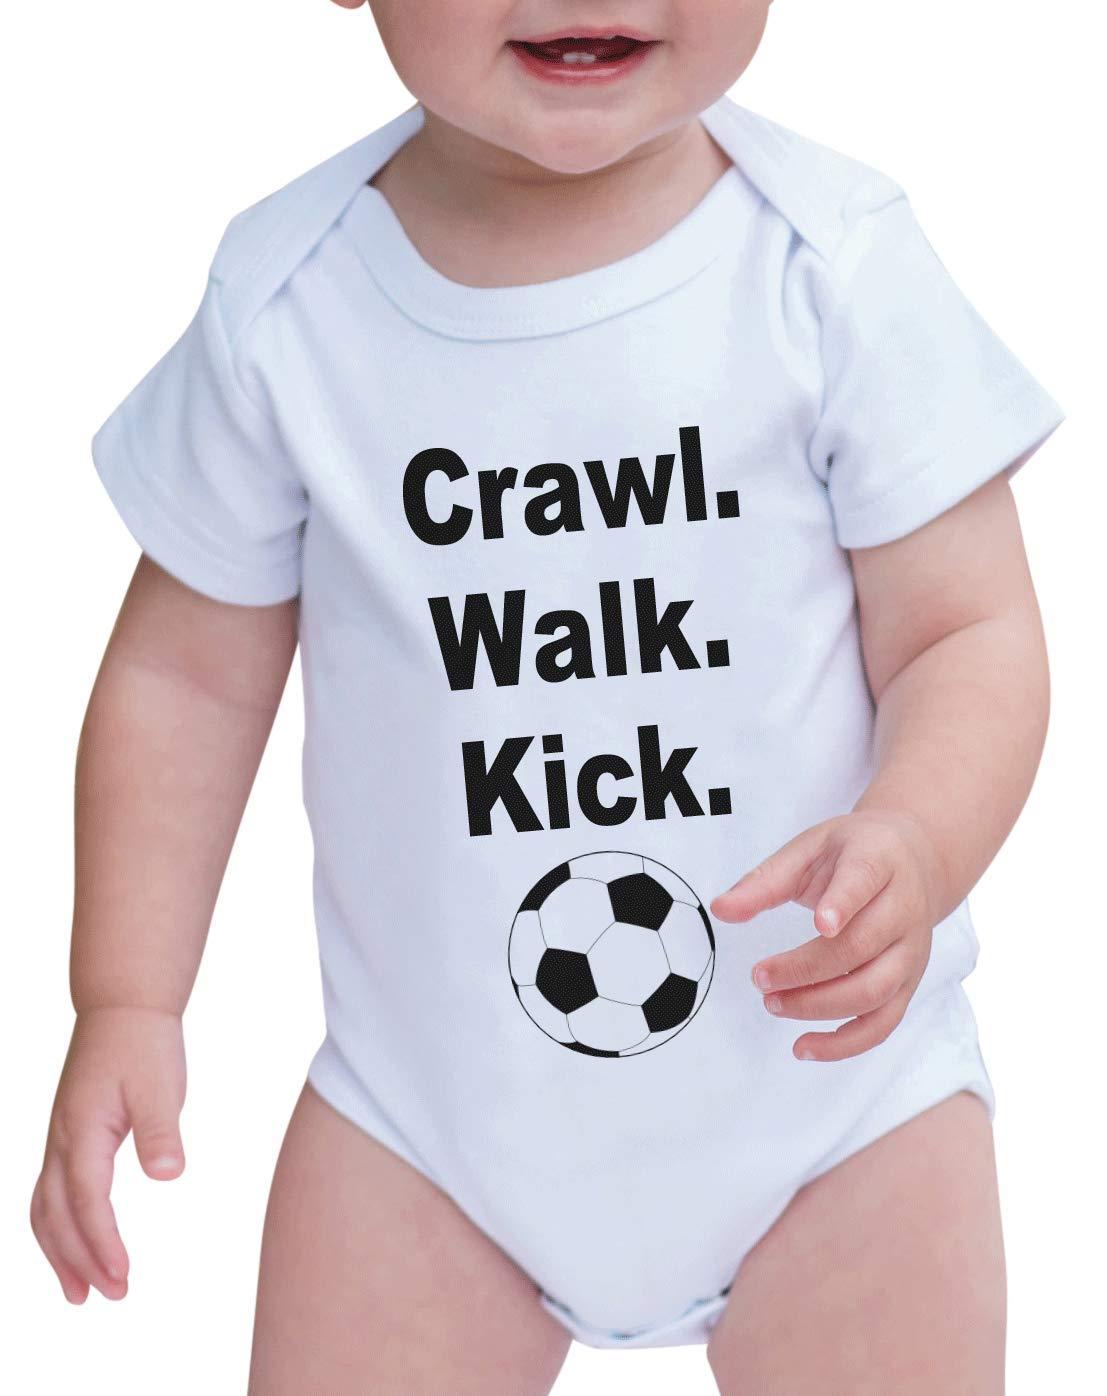 7 ate 9 Apparel Baby Boy's Crawl. Walk. Kick. Onepiece